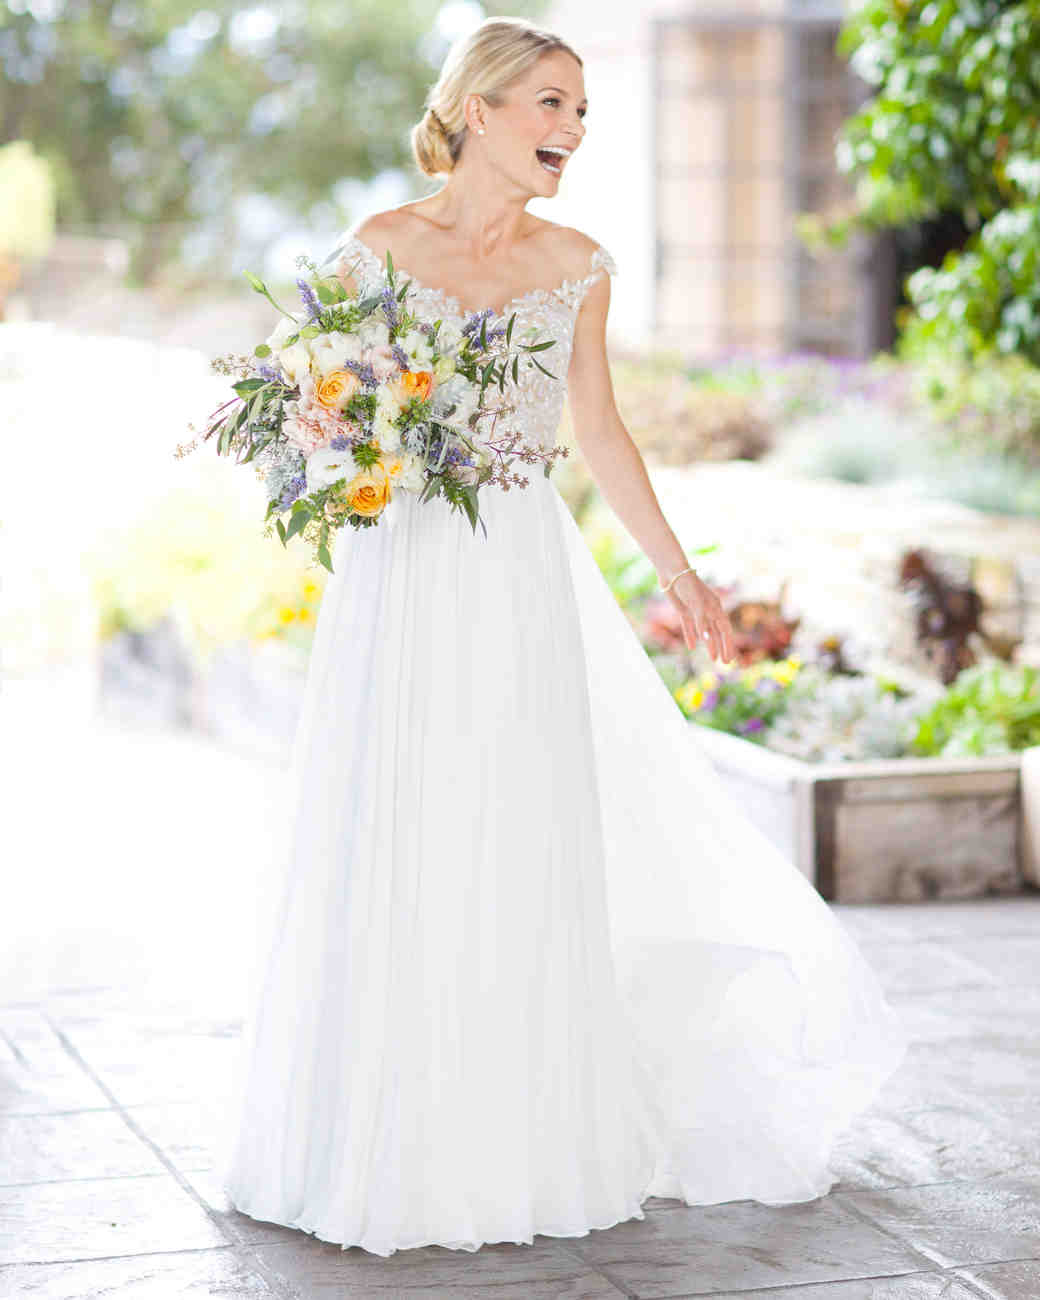 kristin-chris-wedding-bride-131-s112398-0116.jpg